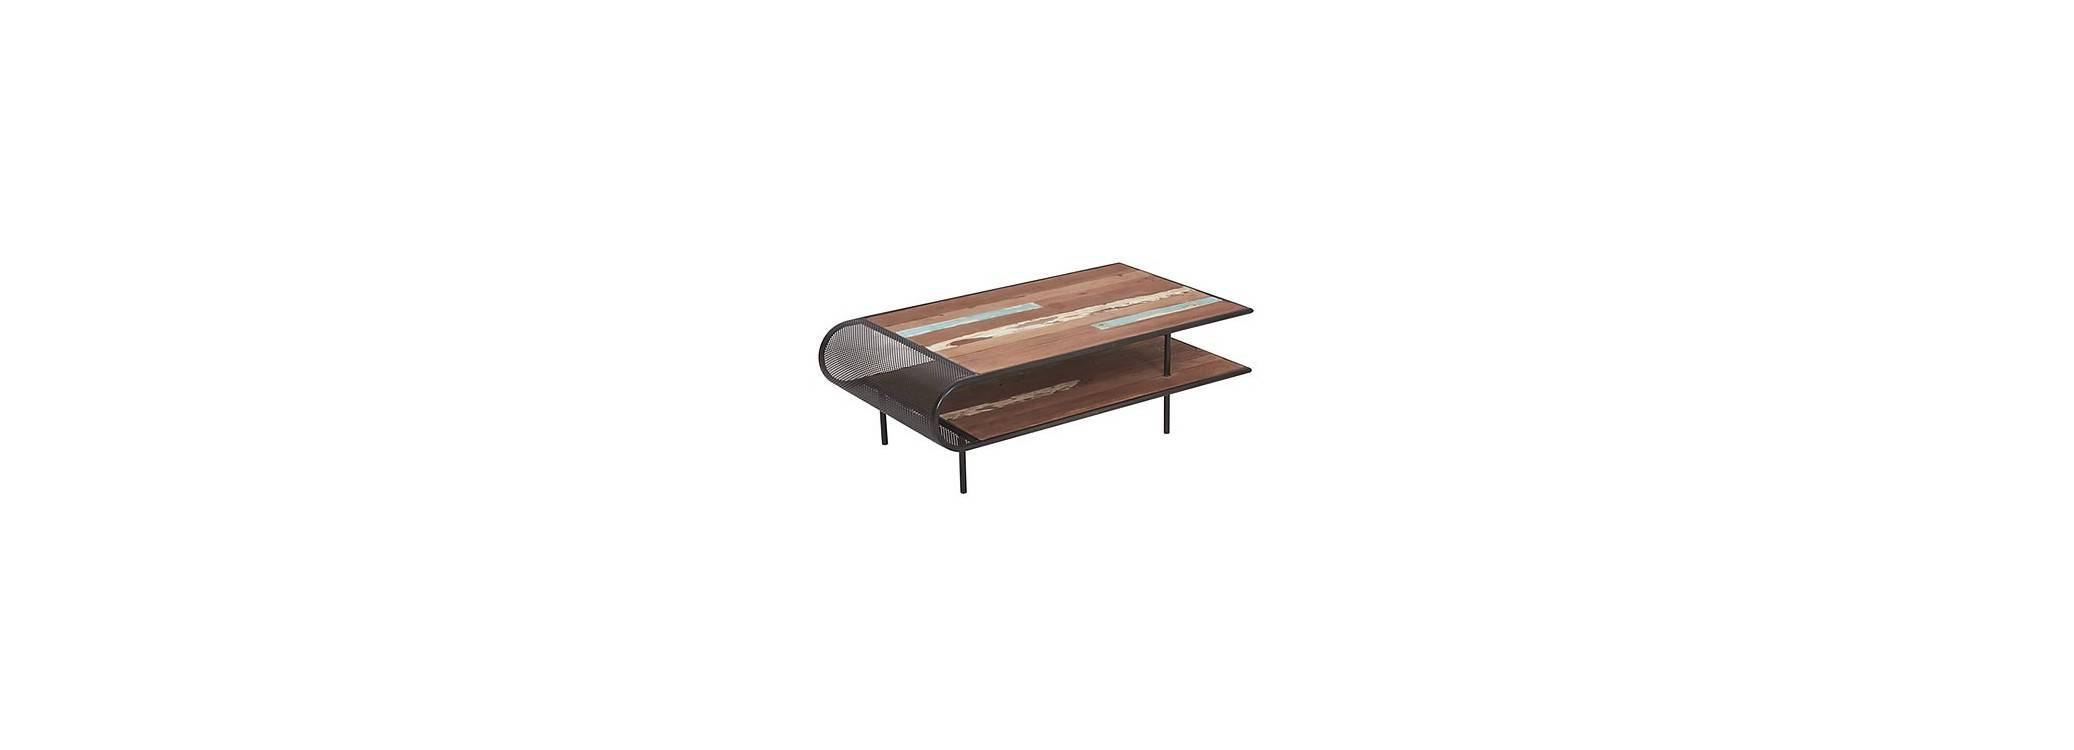 Table basse rectangulaire Aru, plateau double